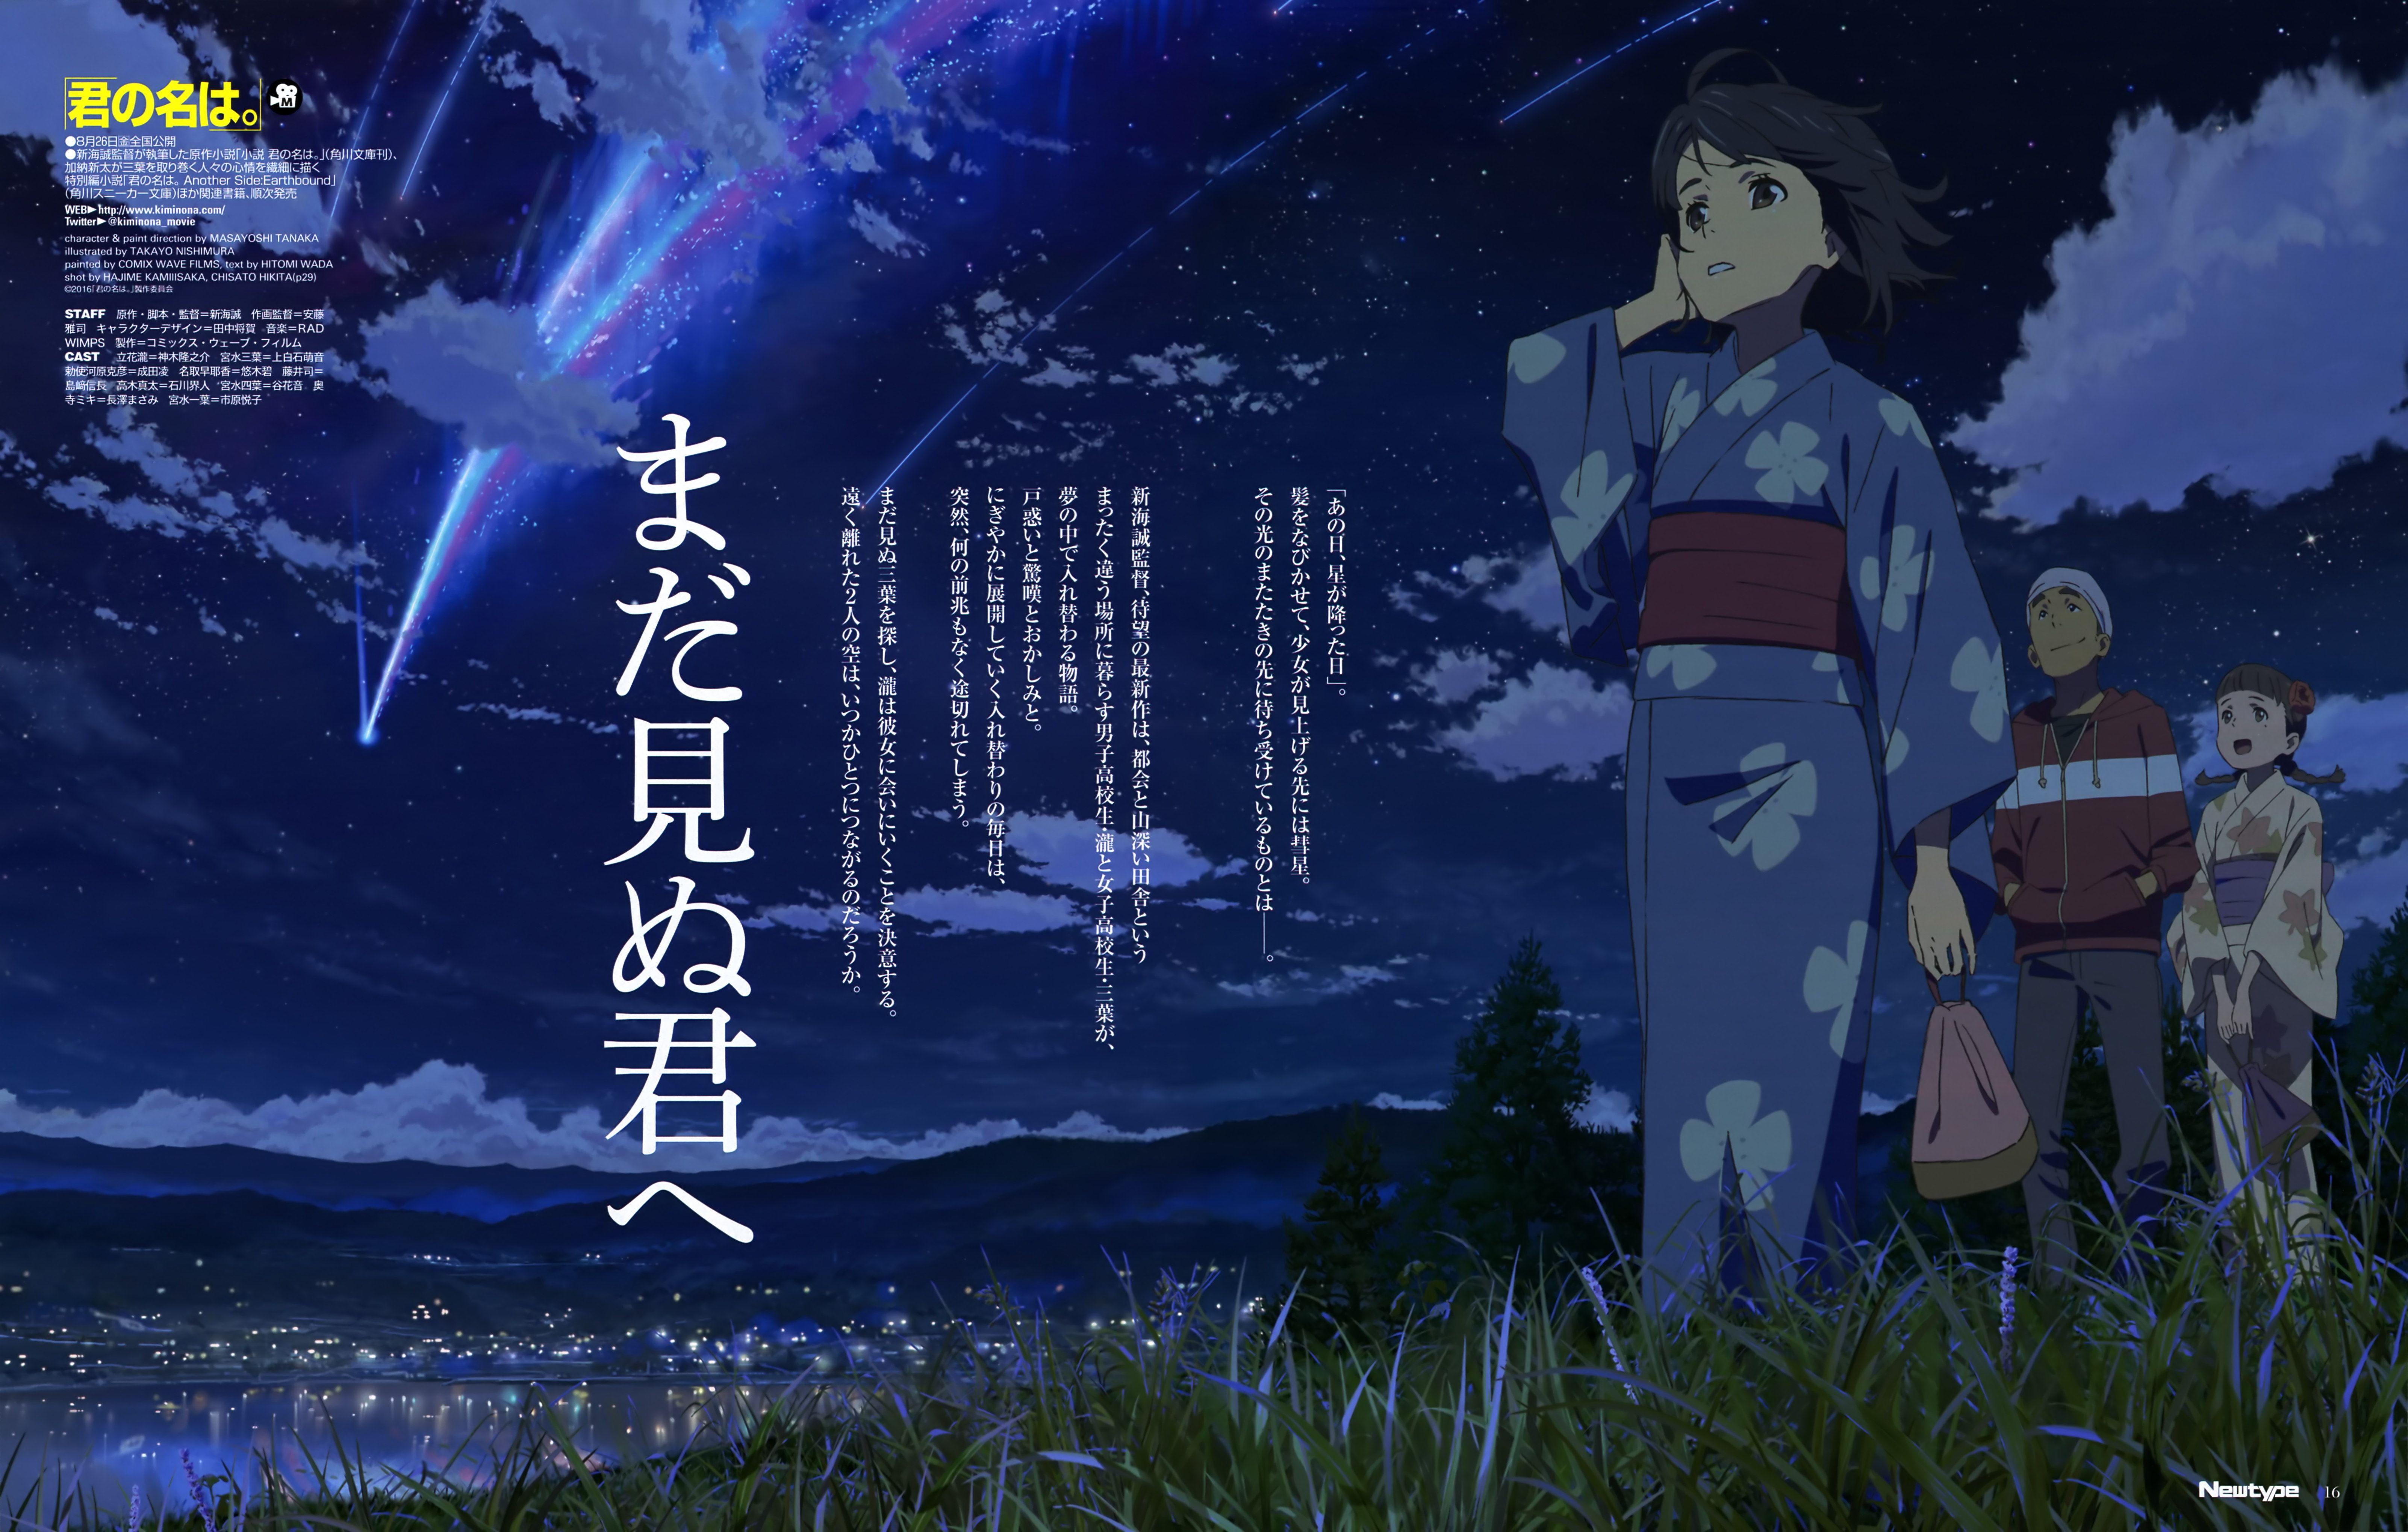 kimi no na wa 2029459 fullsize image 6407x4077 zerochan a imprimer